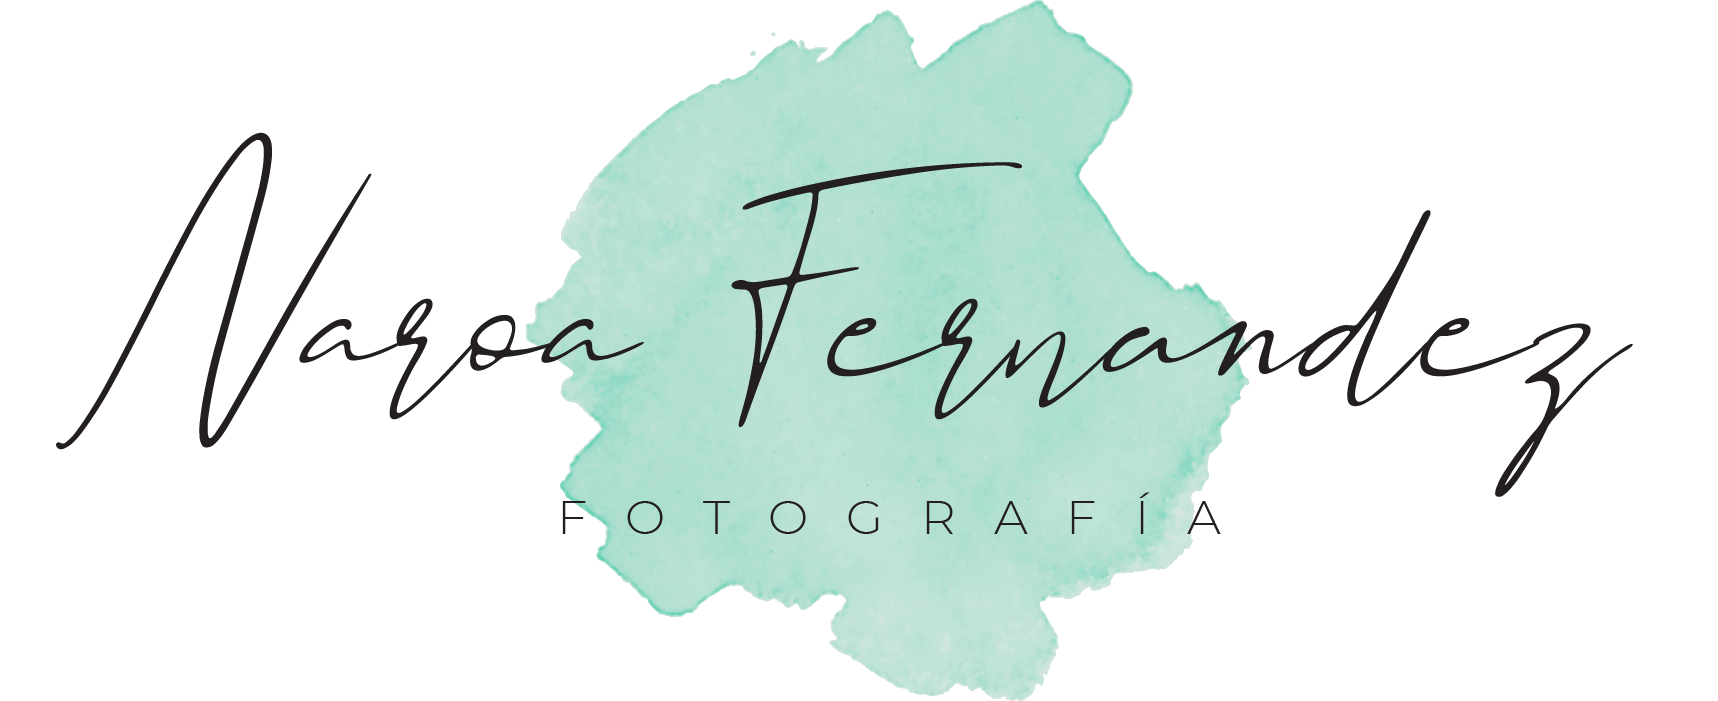 NAROA FERNÁNDEZ FOTOGRAFÍA  / - Fotografía Narrativa. Bodas, Eventos, Newborn, Comunicación y Editorial. Getxo-Bilbao.